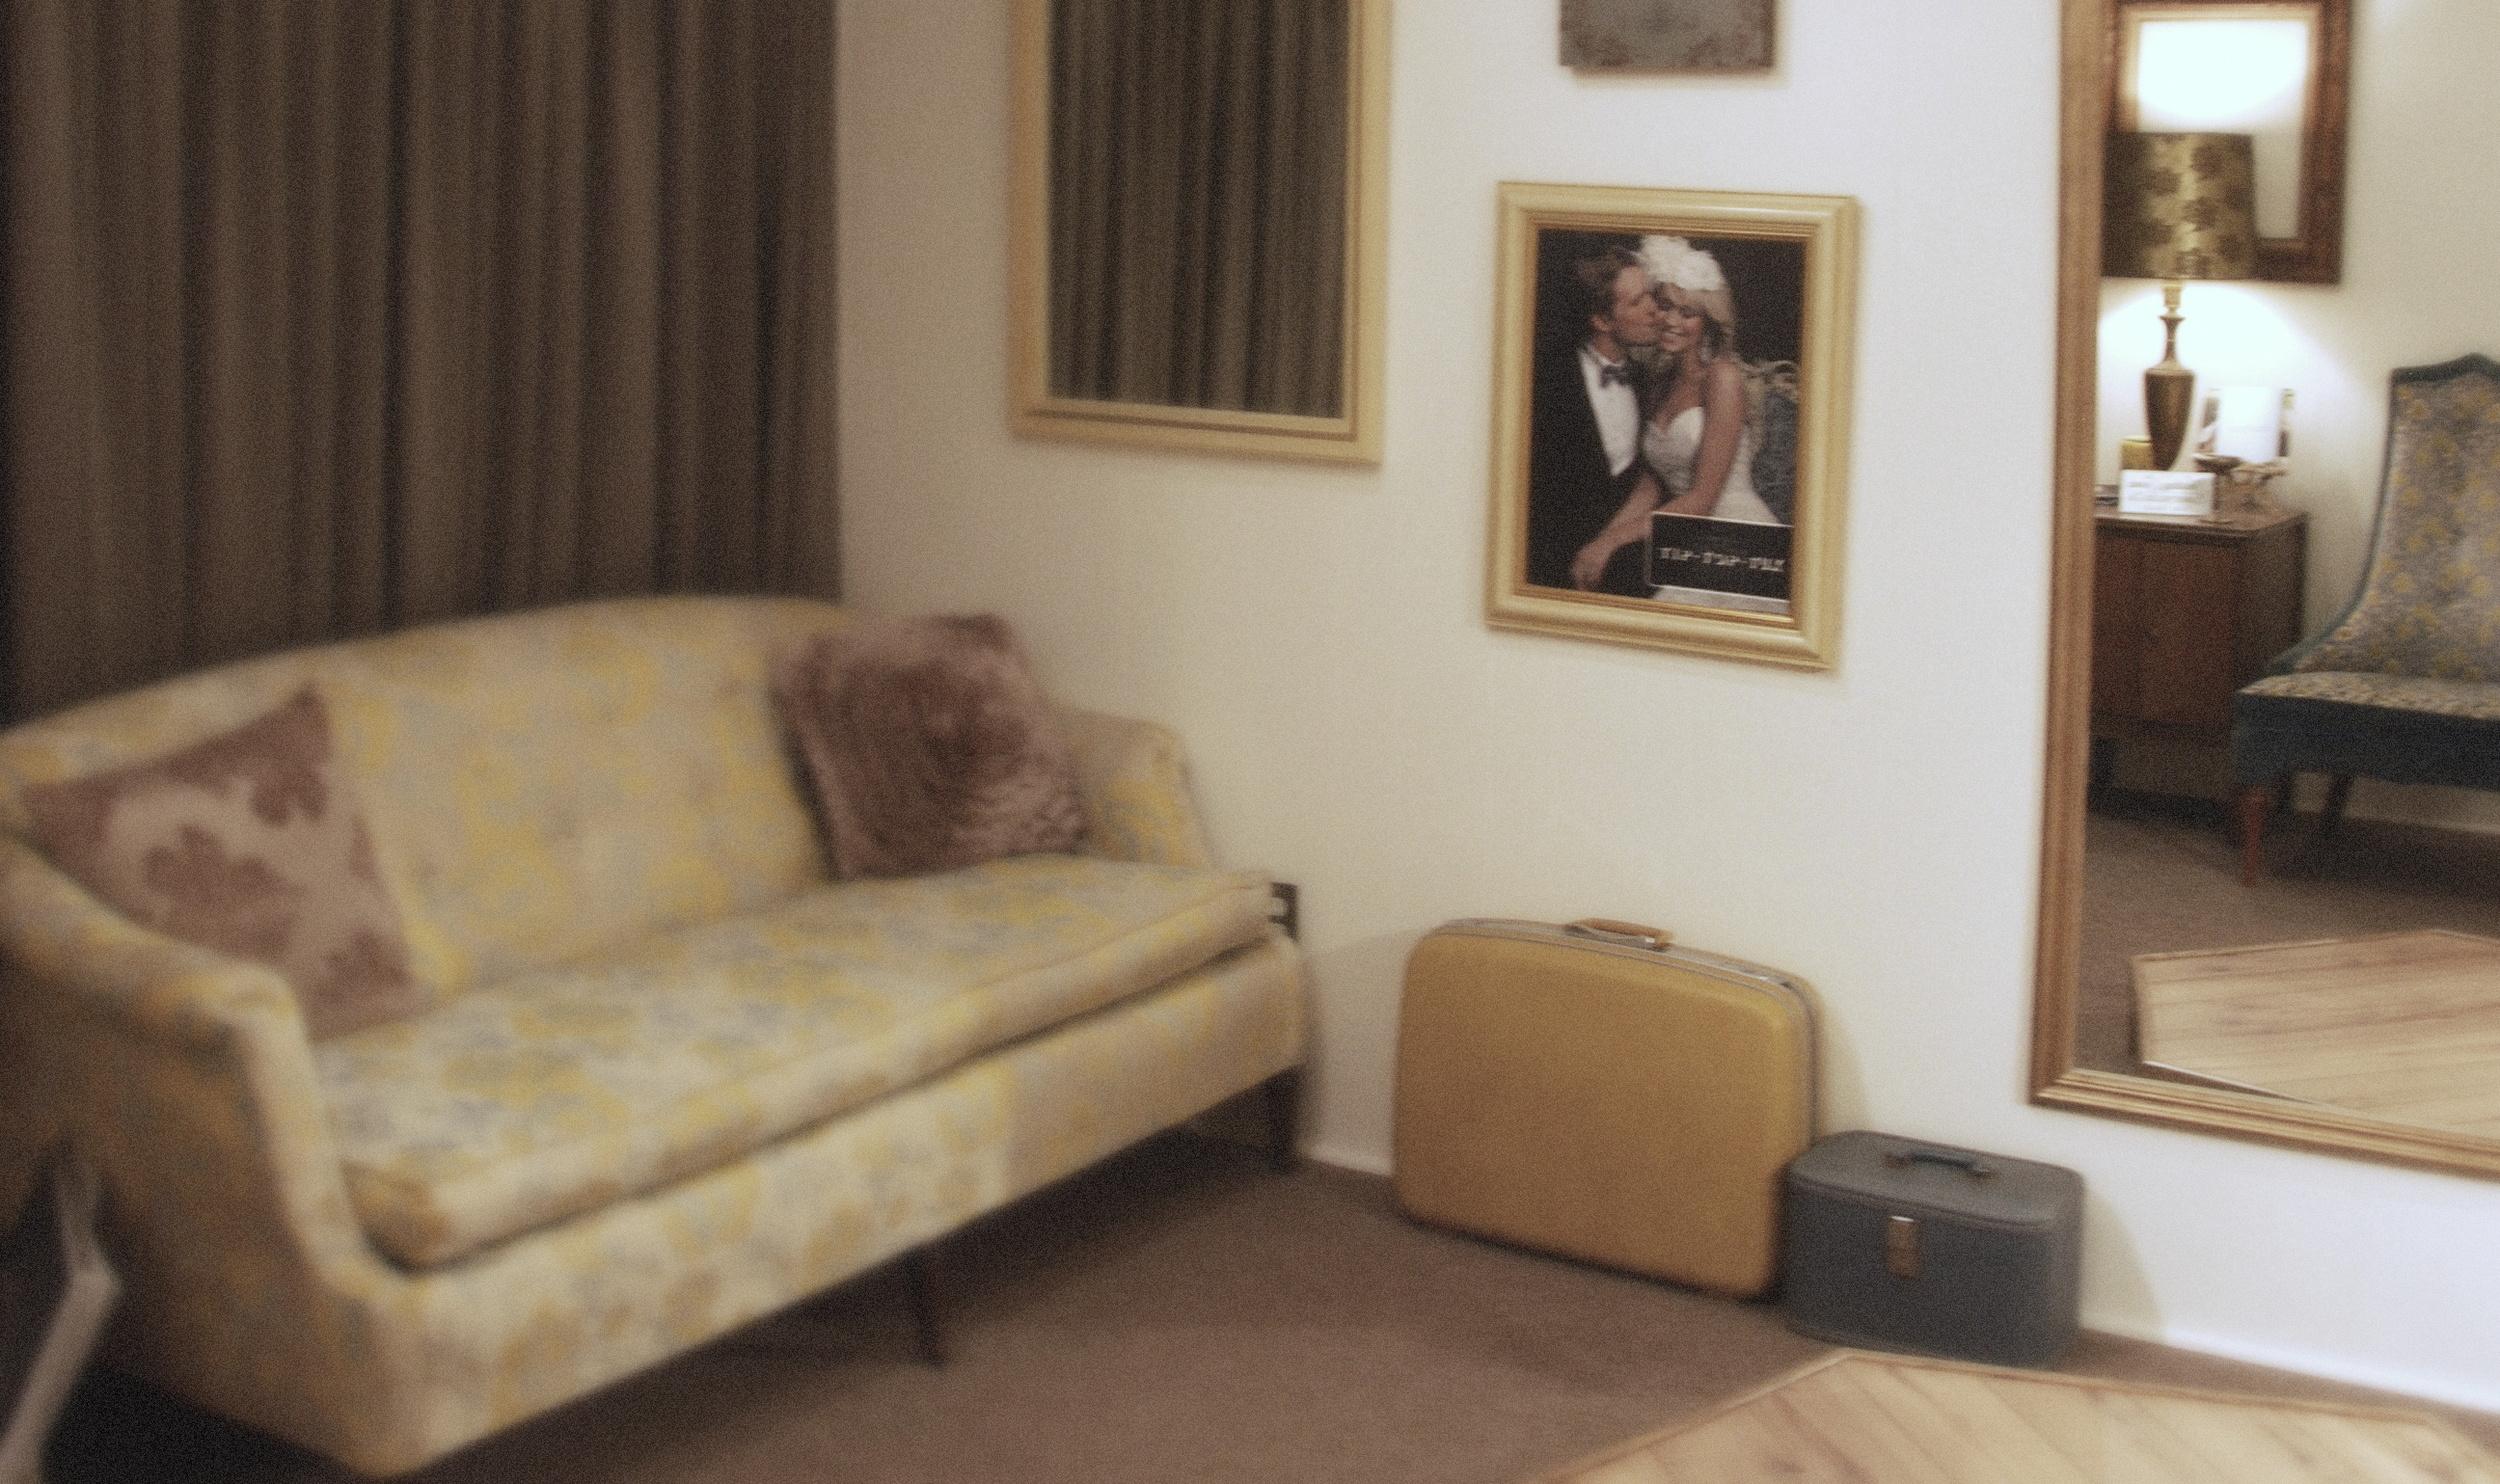 couchfittingroom.f.JPG